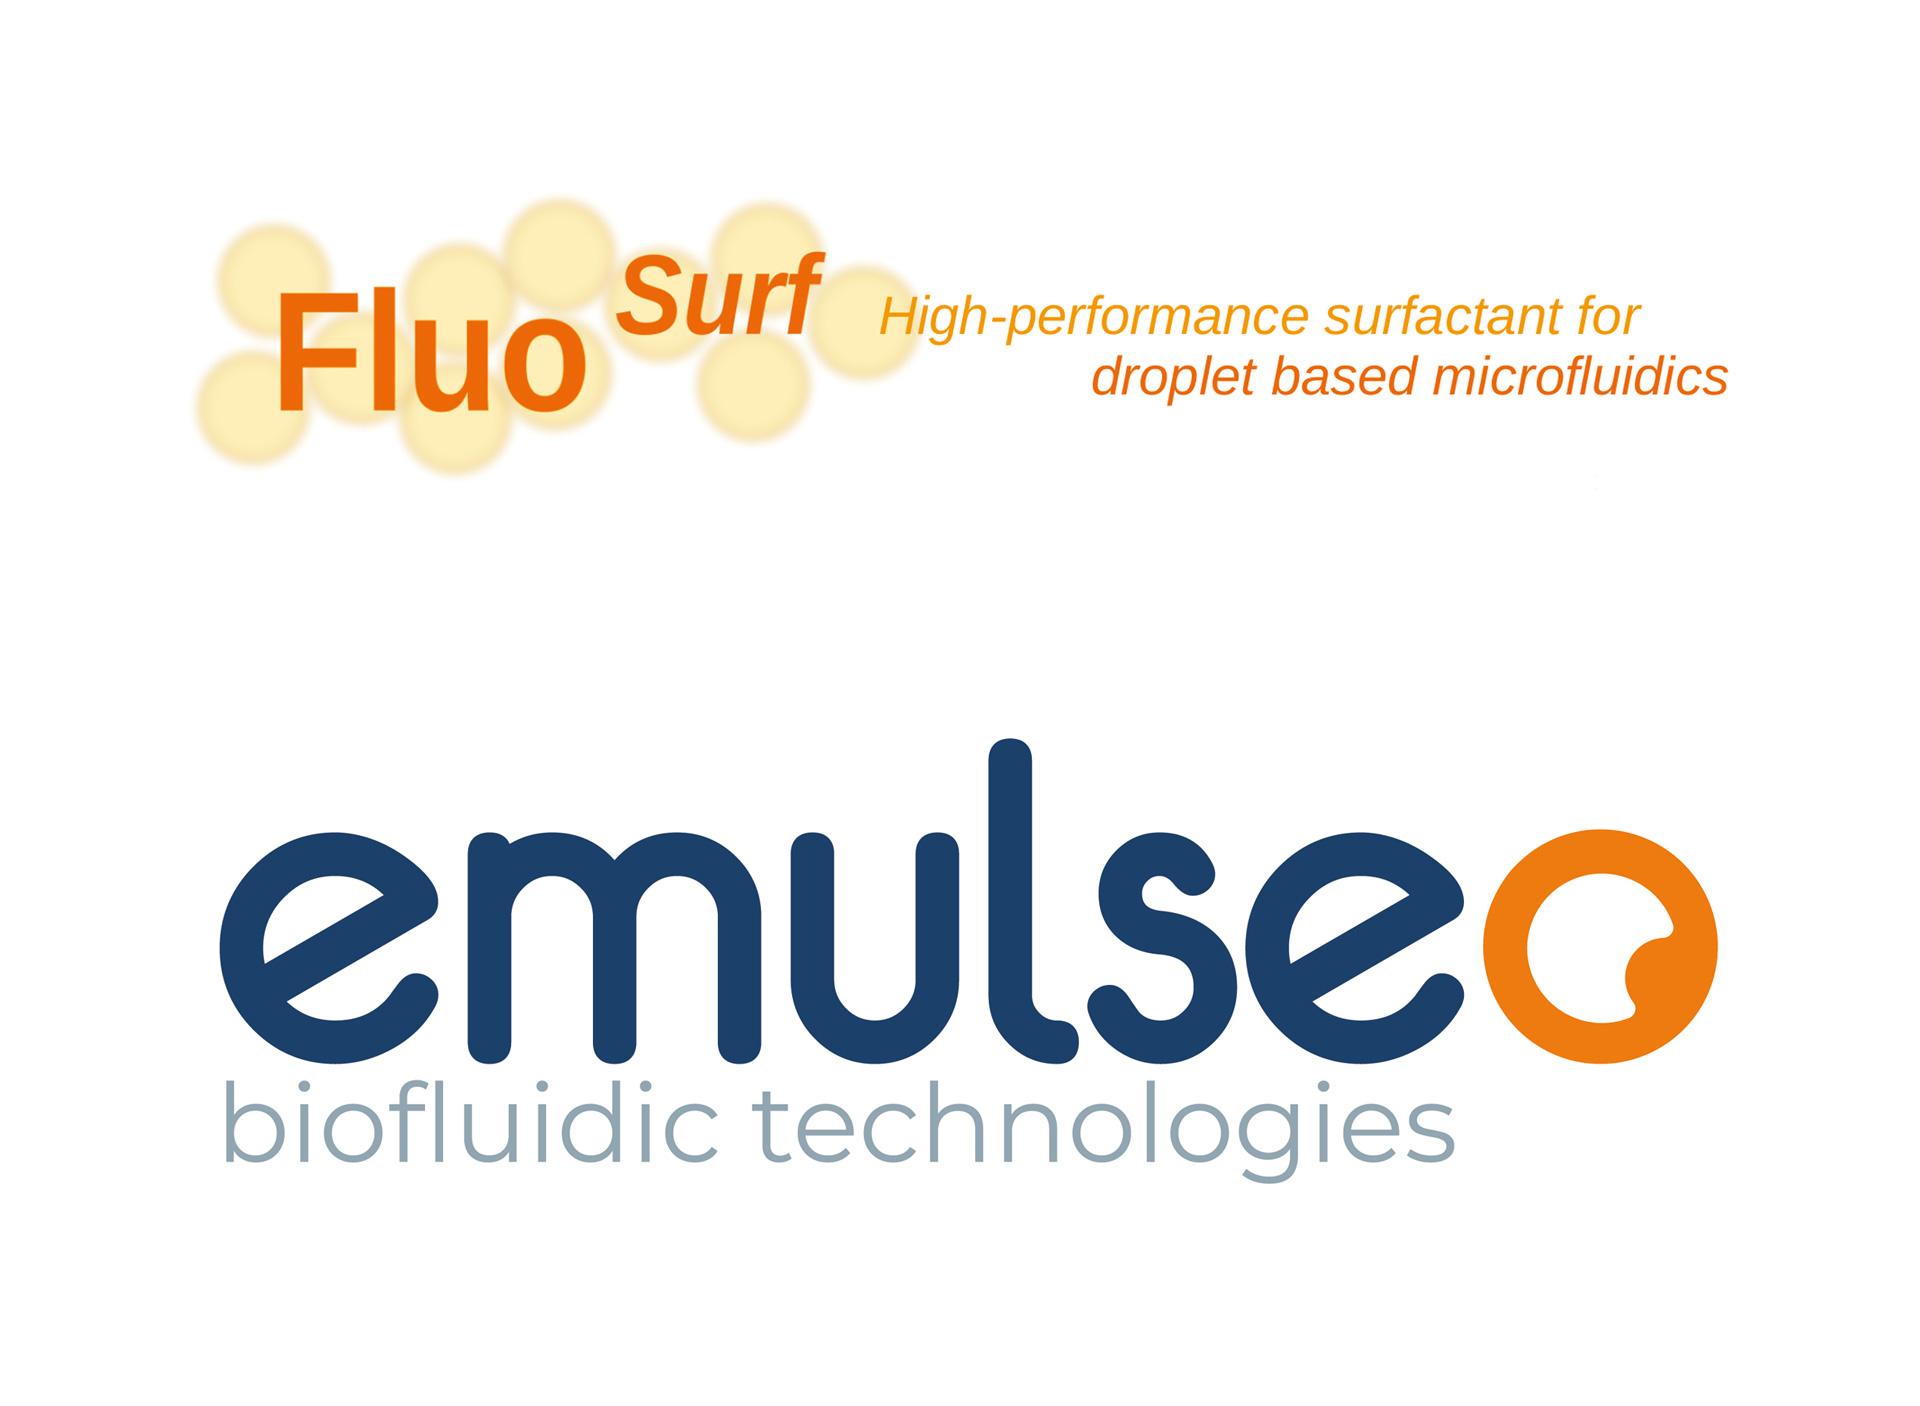 FluoSurf Emulseo Logo